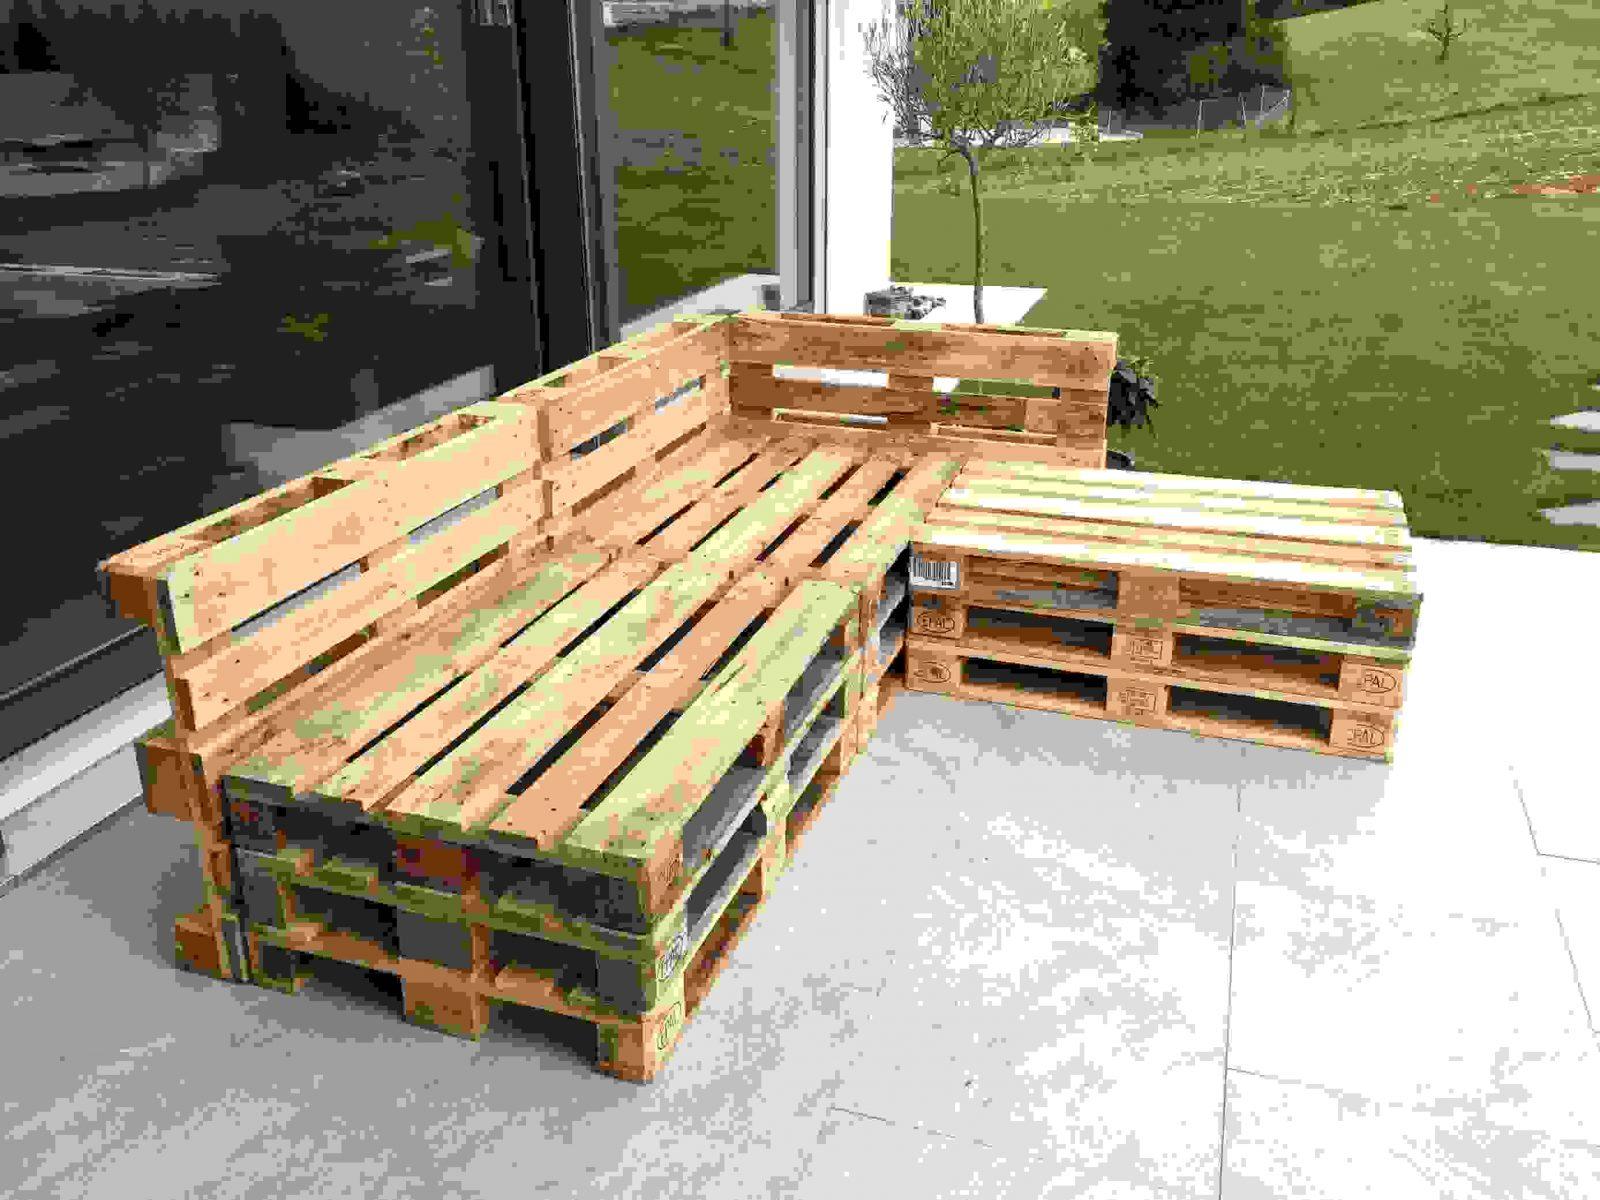 Garten eckbank selber bauen haus design ideen - Eckbank balkon selber bauen ...